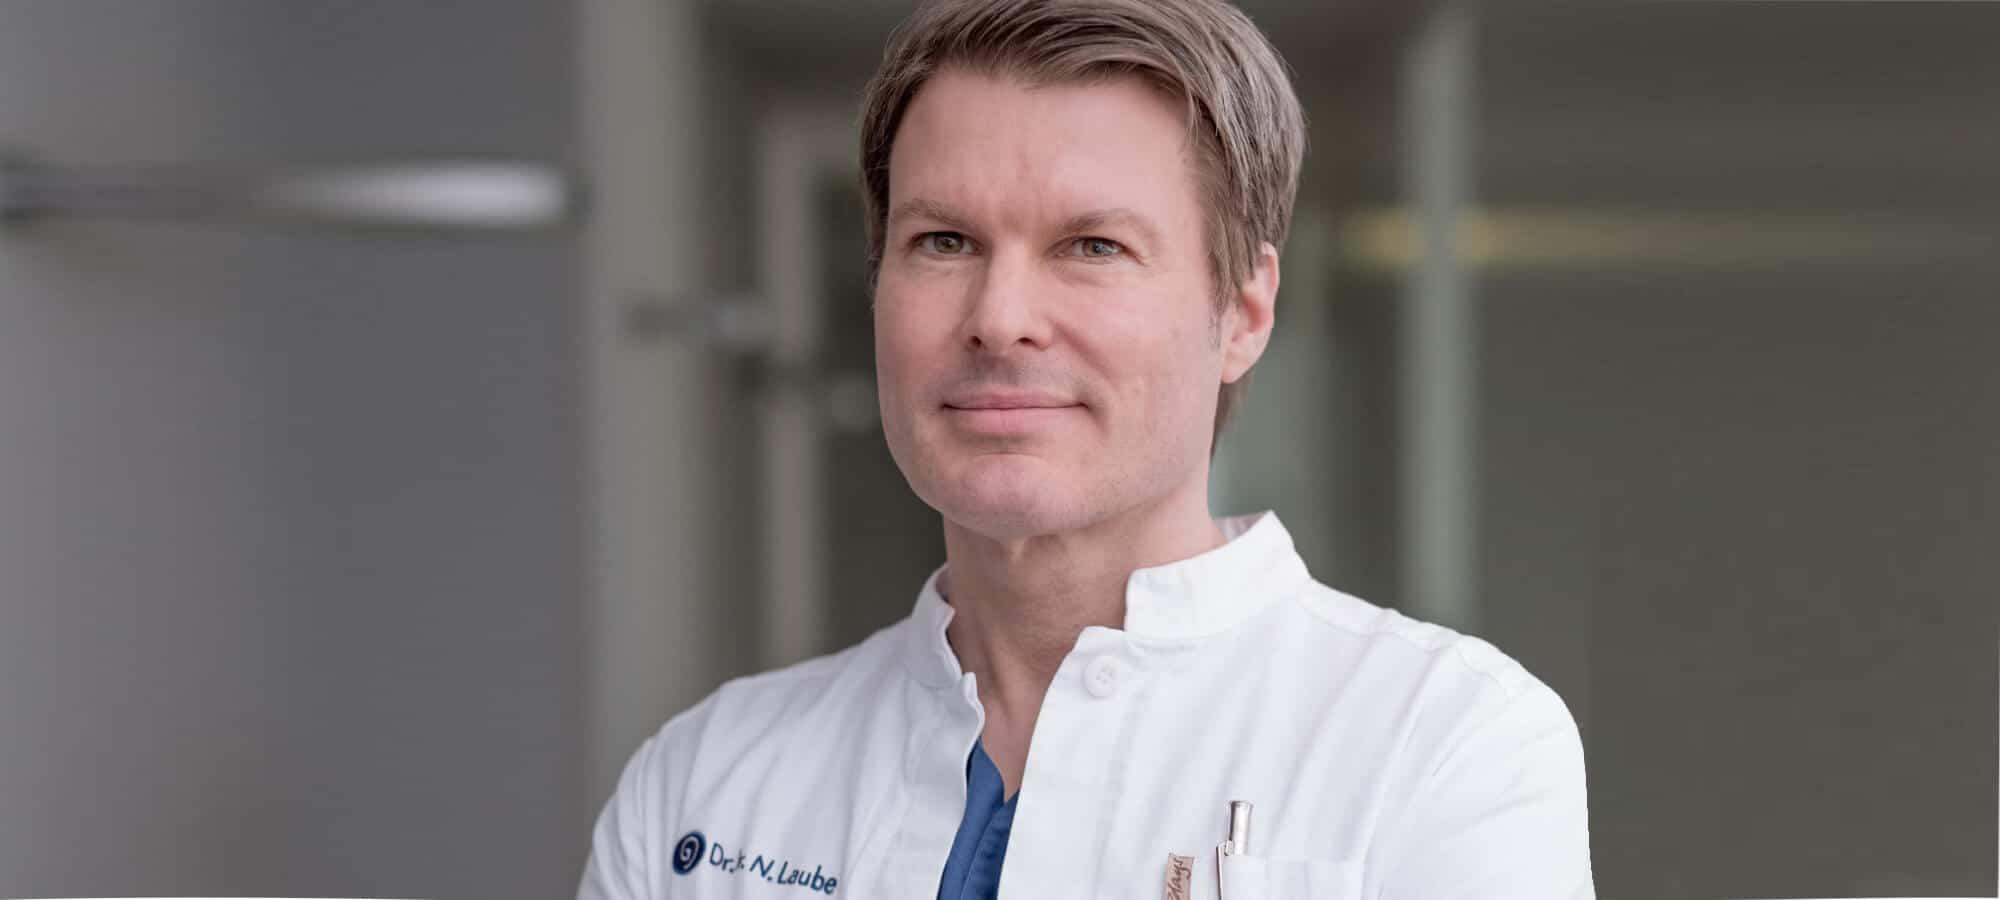 Dr. Dr. Nico Laube in Frankfurt   groisman & laube